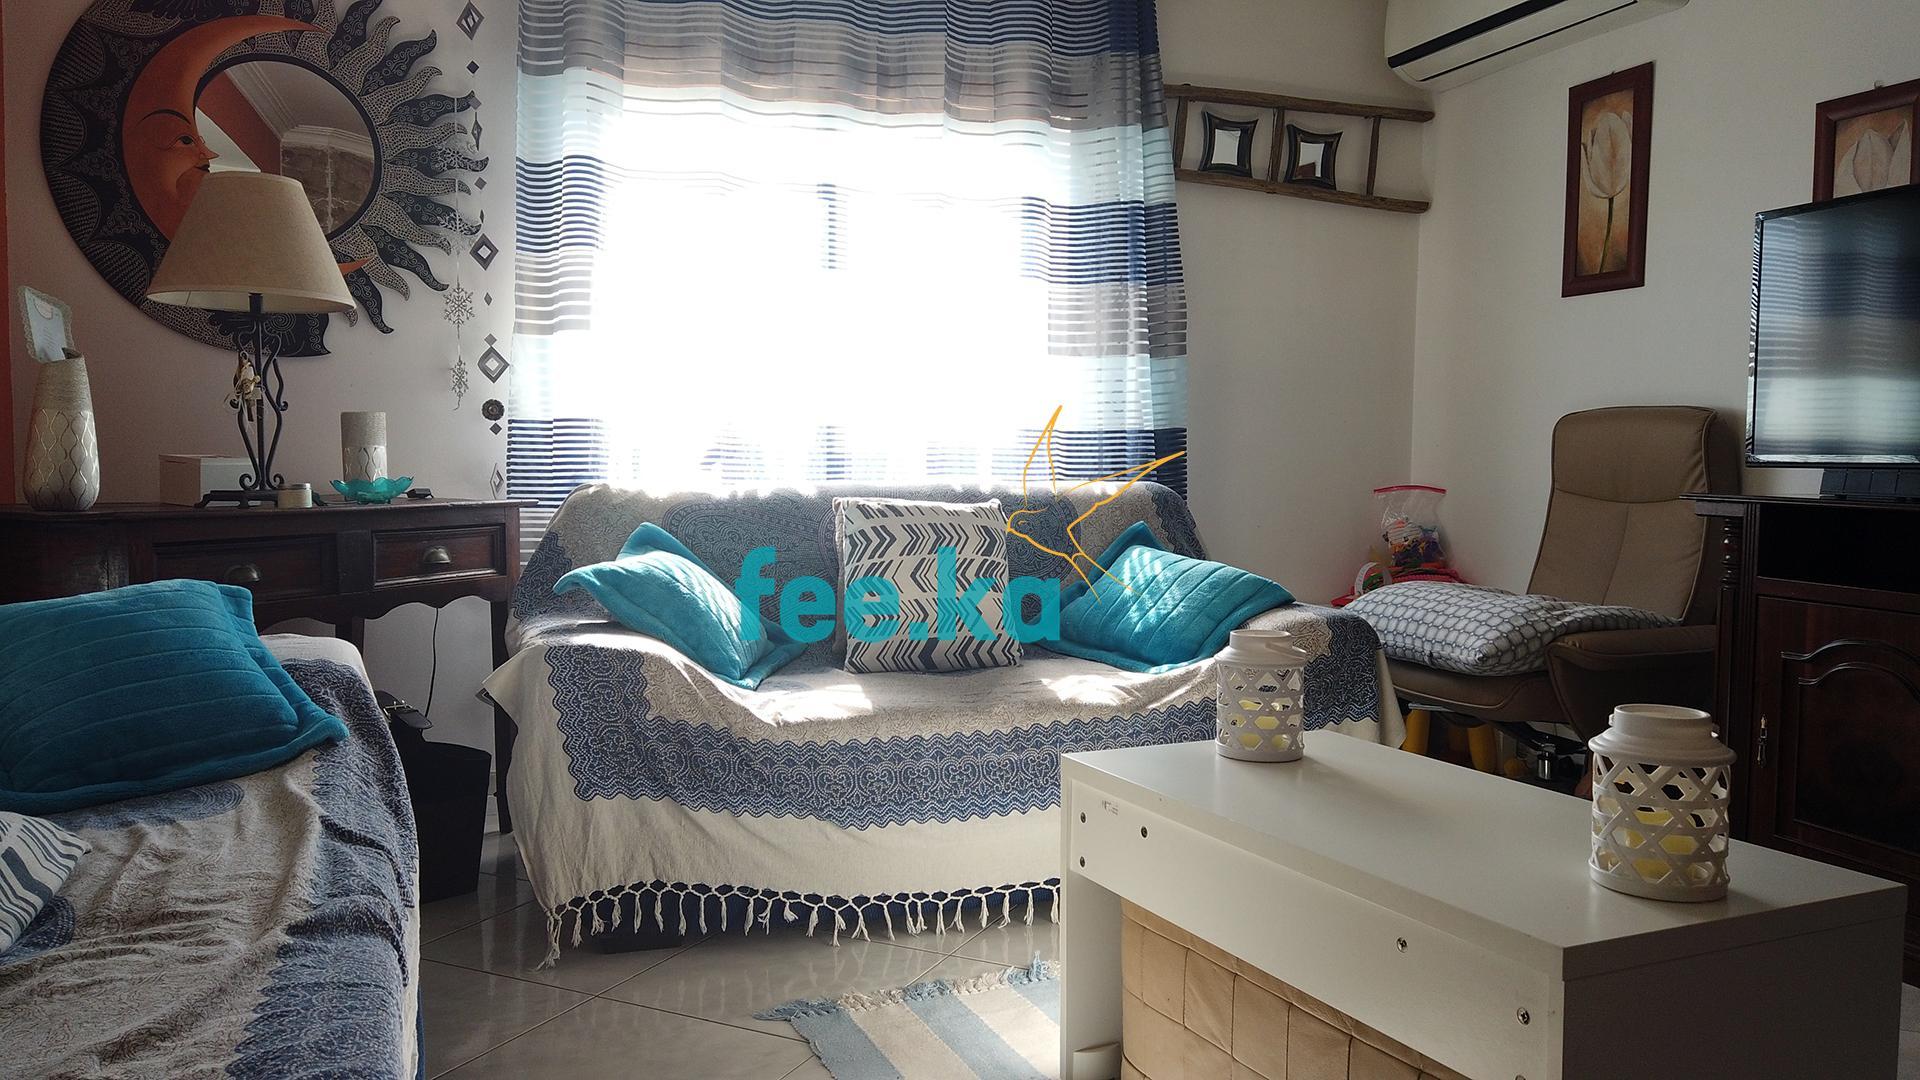 Apartamento T3 com áreas fabulosas  - Castelo Branco, Castelo Branco